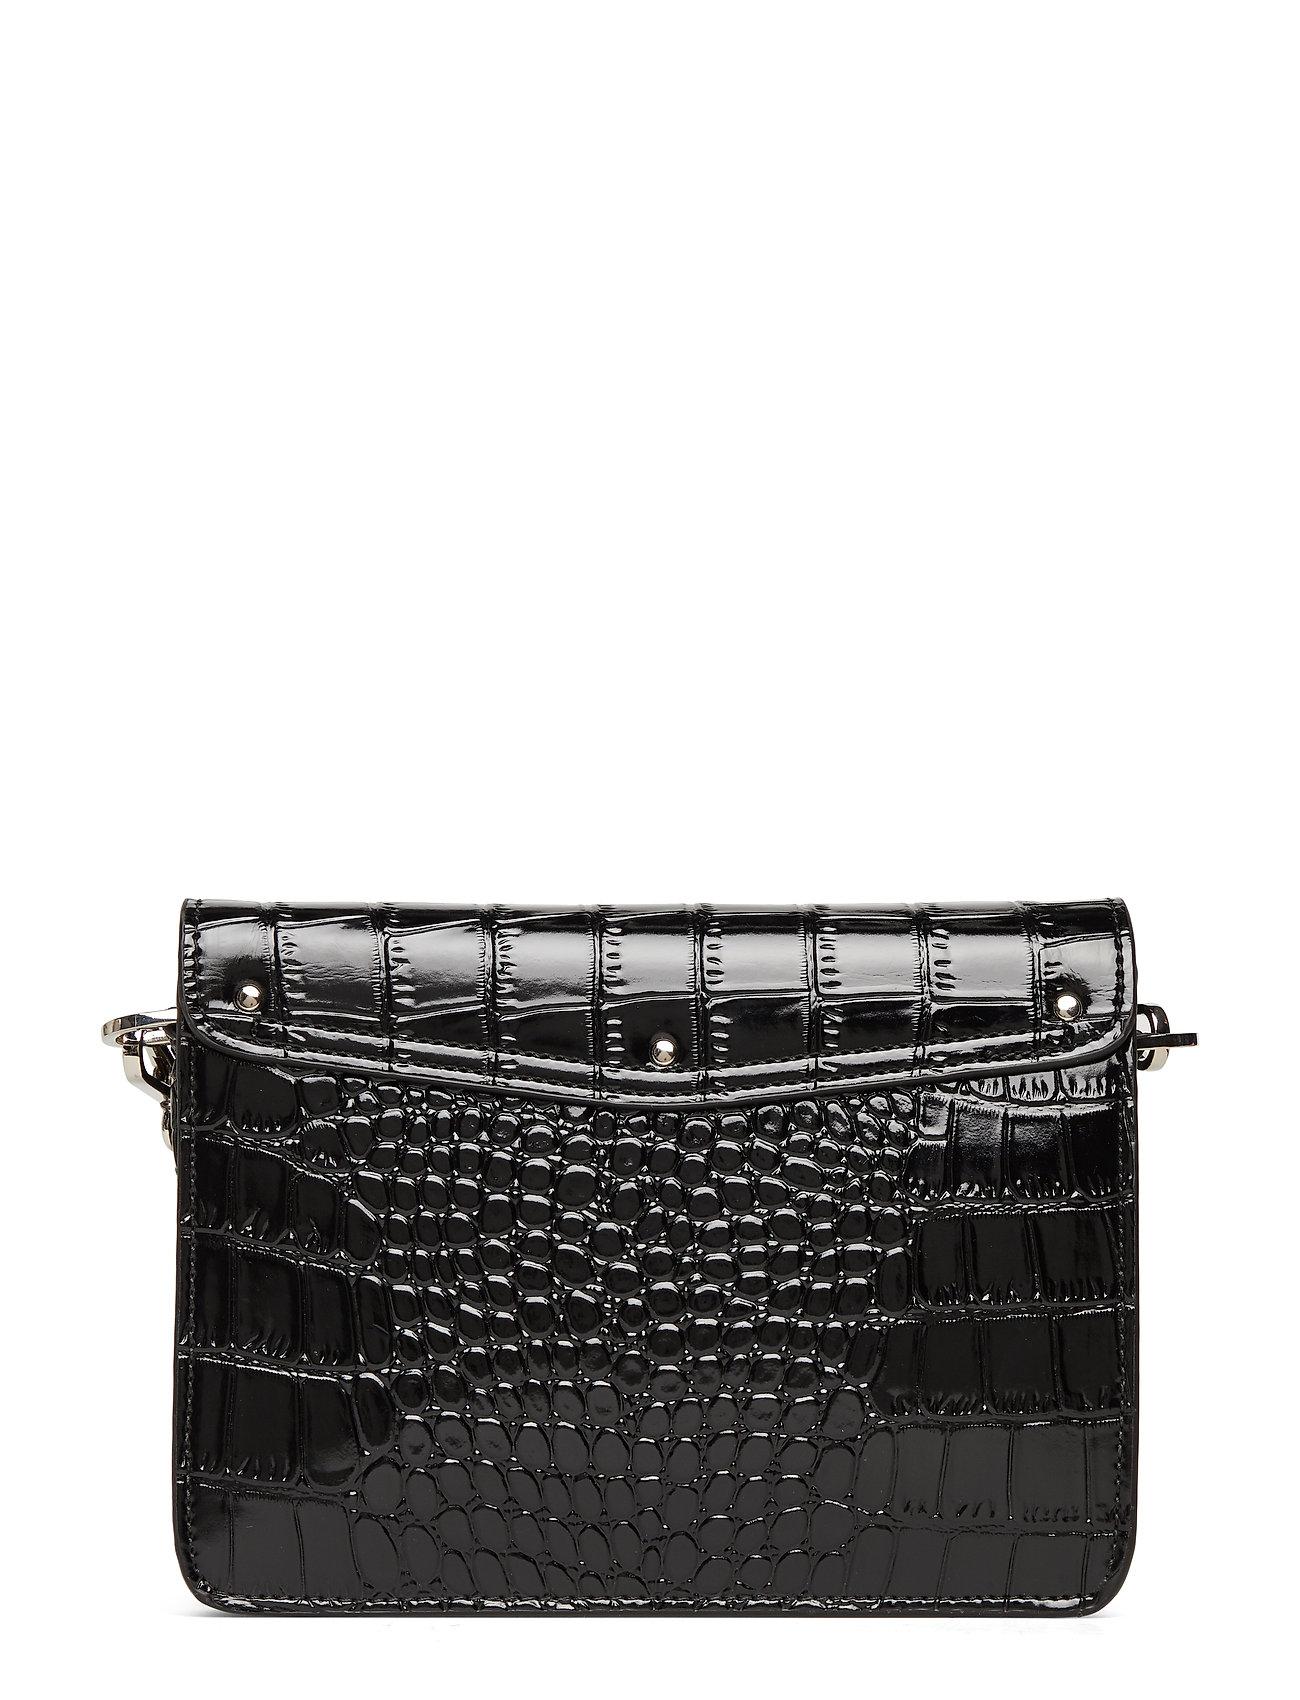 Bag Bag RosemaryblackAdax Unlimit Shoulder Unlimit Bag RosemaryblackAdax Shoulder Unlimit Shoulder PXZOkiu